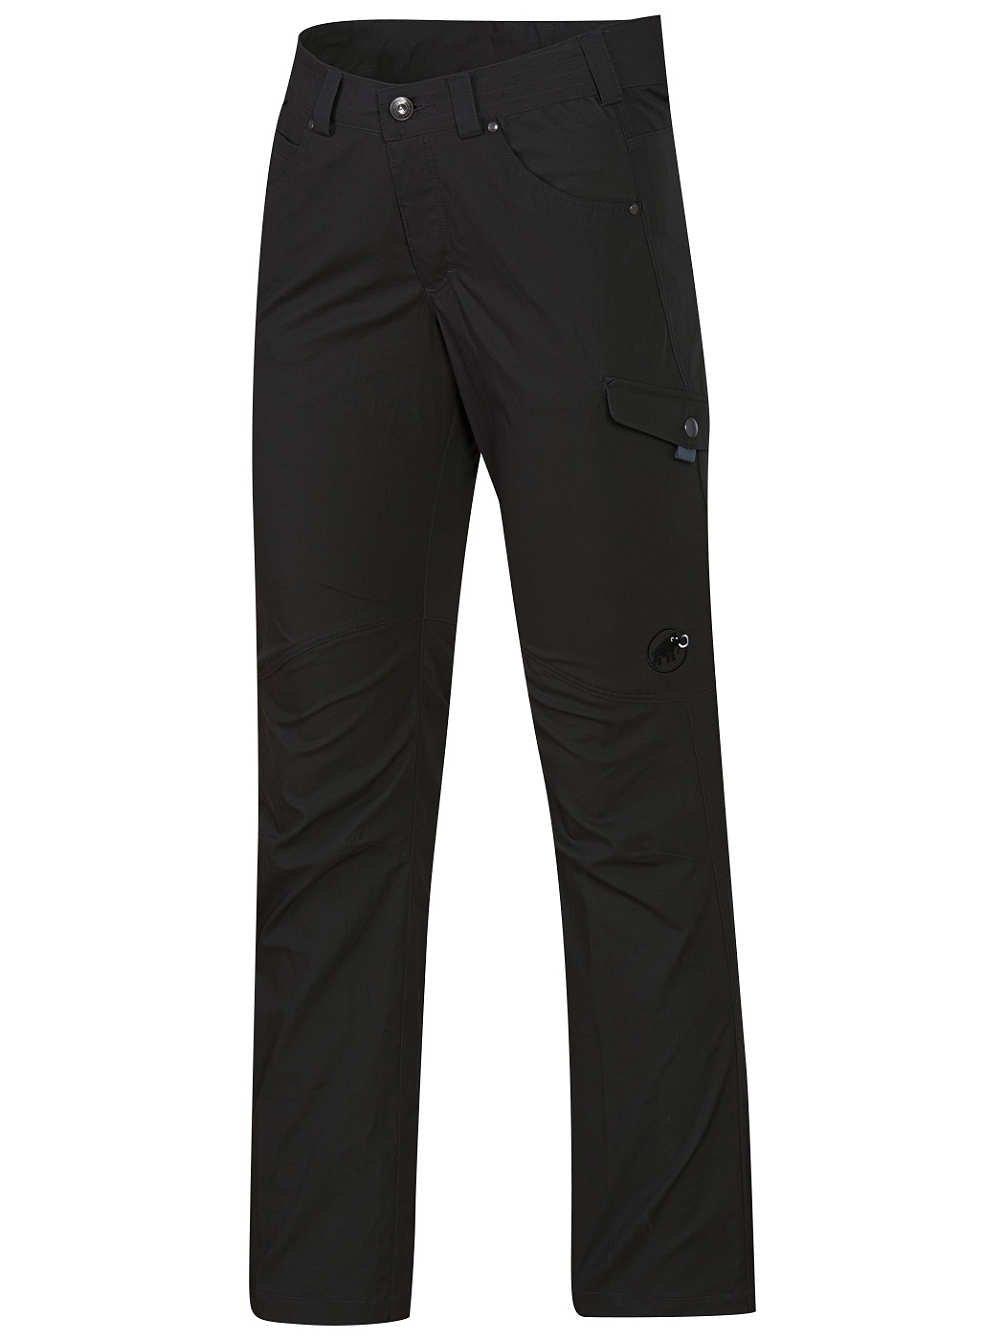 Mammut Trovat Pants Damens - Outdoorhose